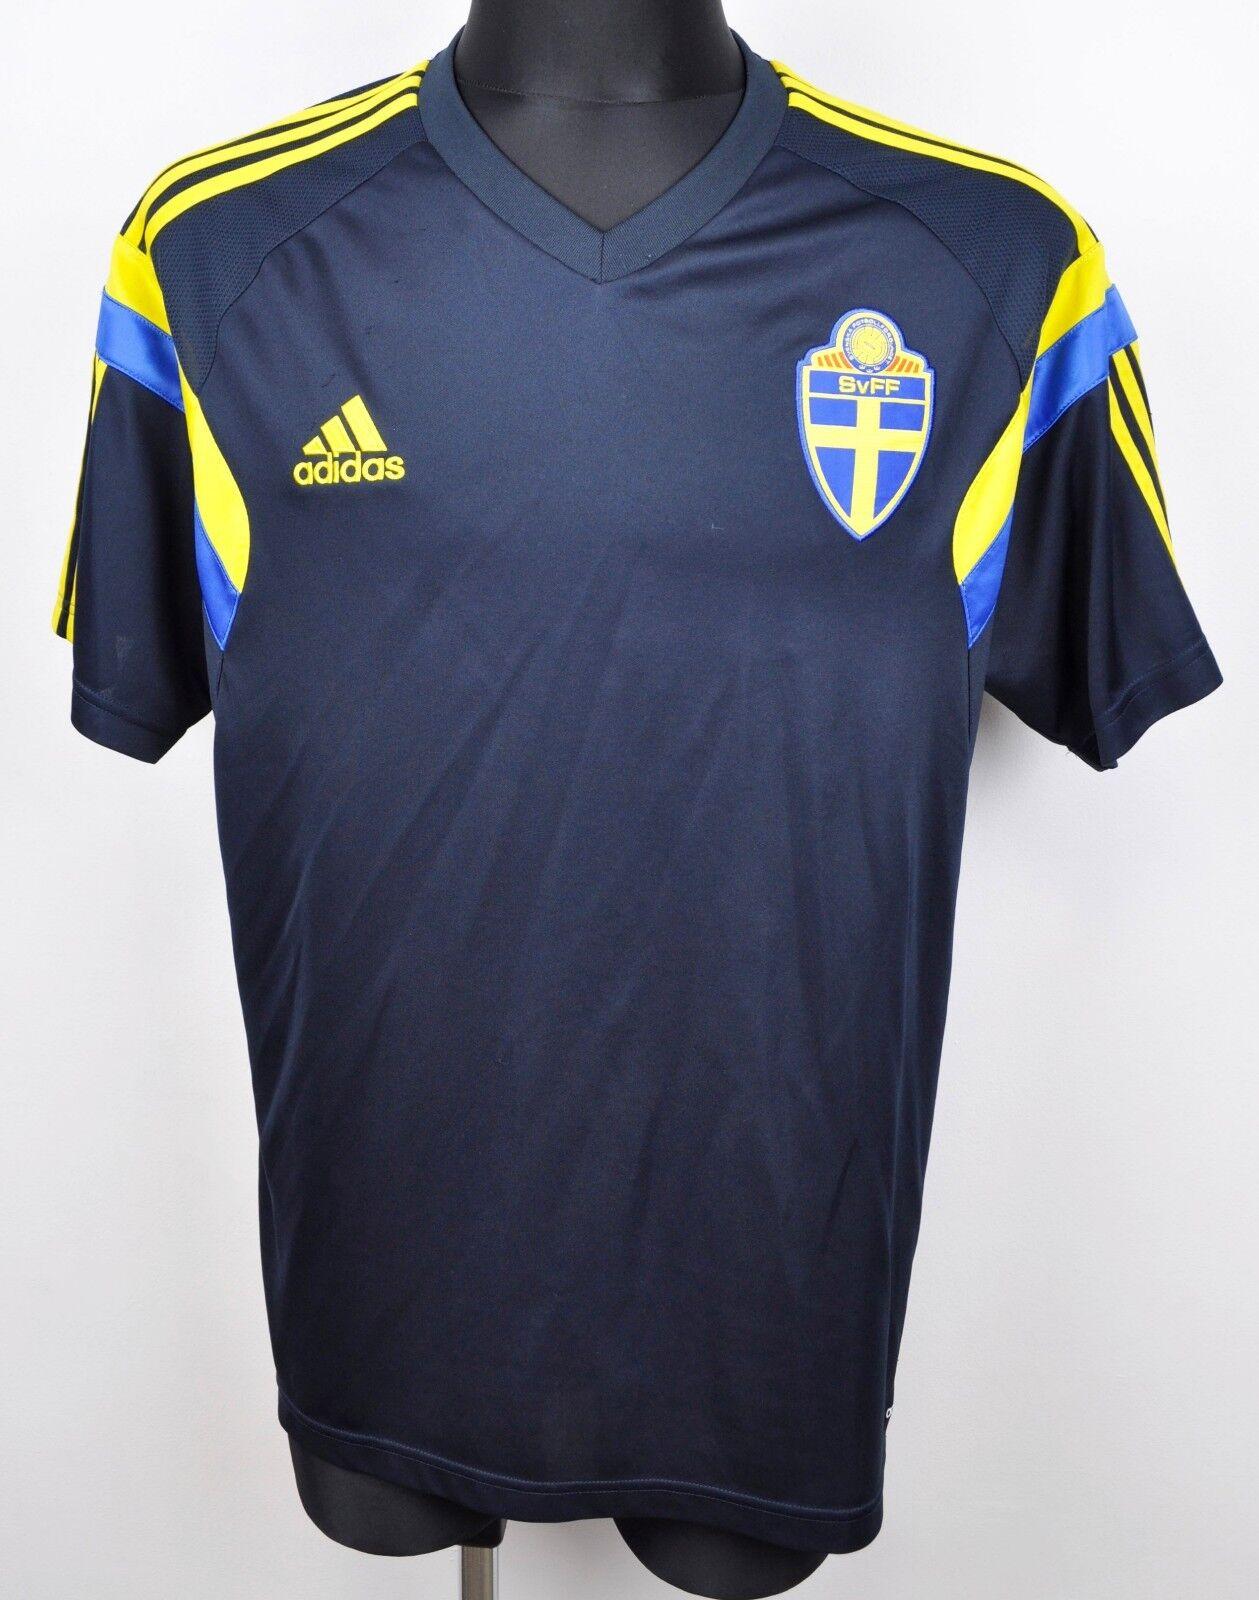 SWEDEN Away National Football Shirt 2014 Men's XL Jersey Adidas Trikot Swedish